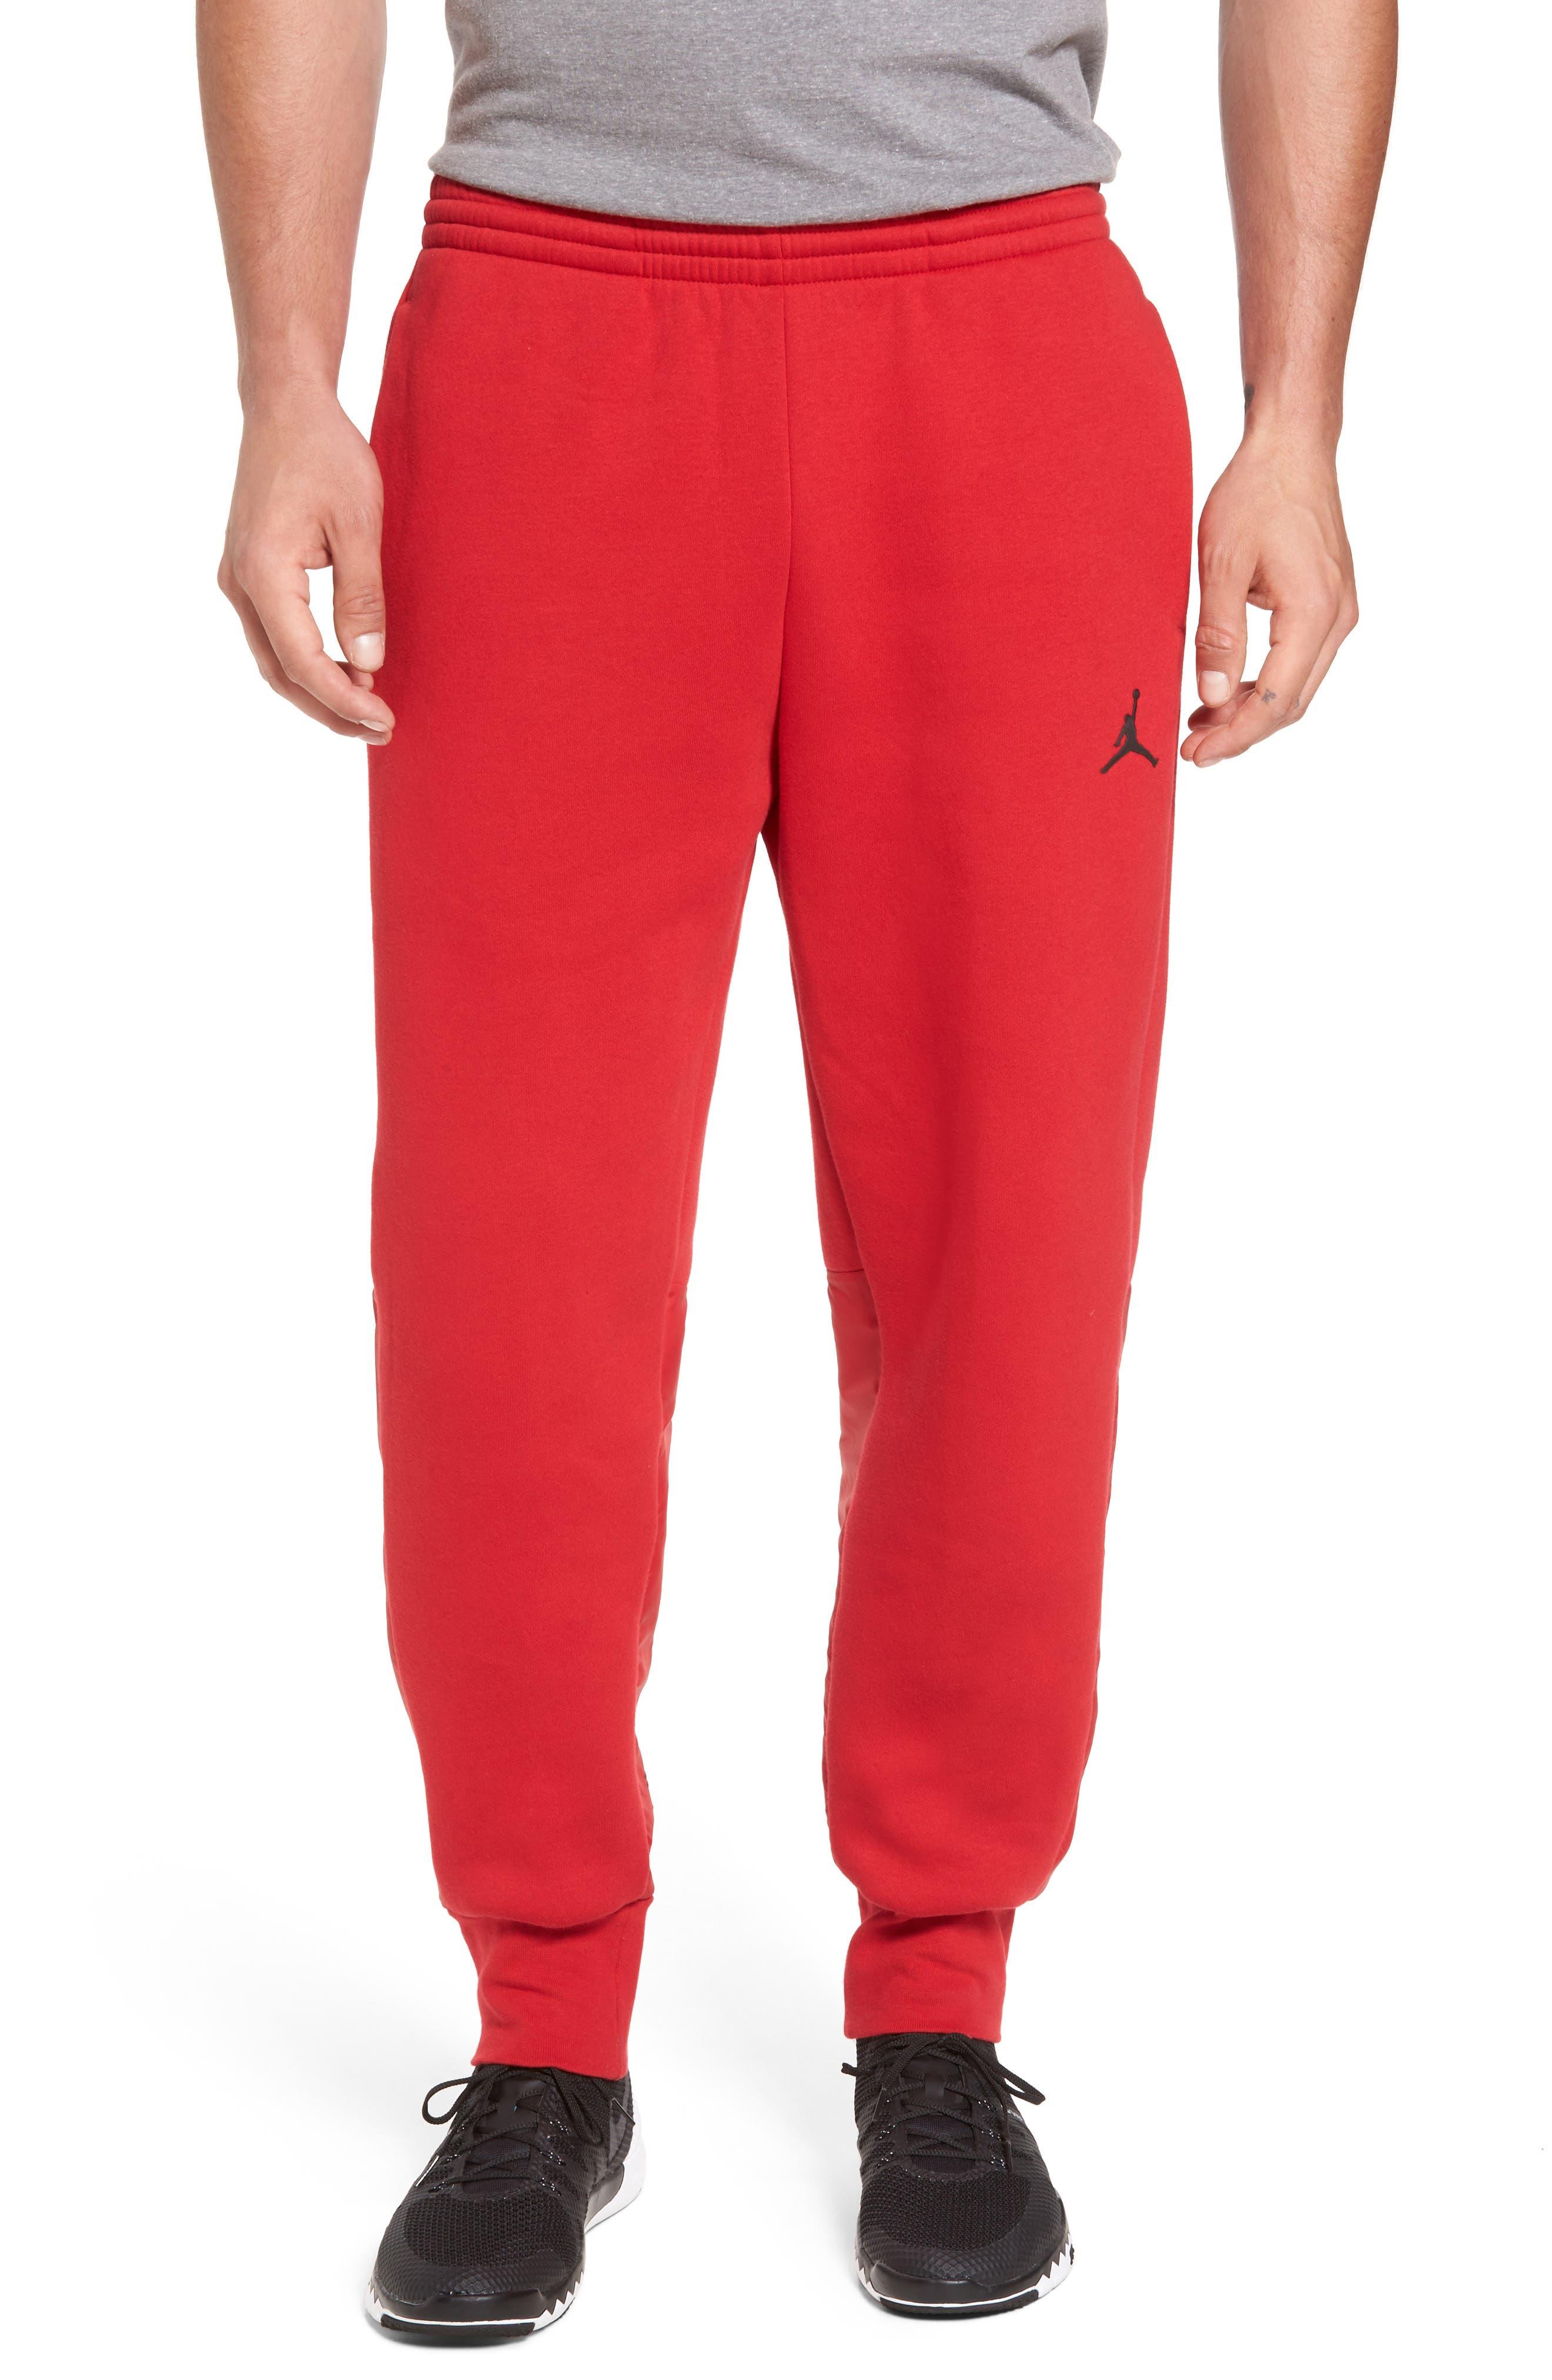 Jordan AJ11 Hybrid Pants,                         Main,                         color, Gym Red